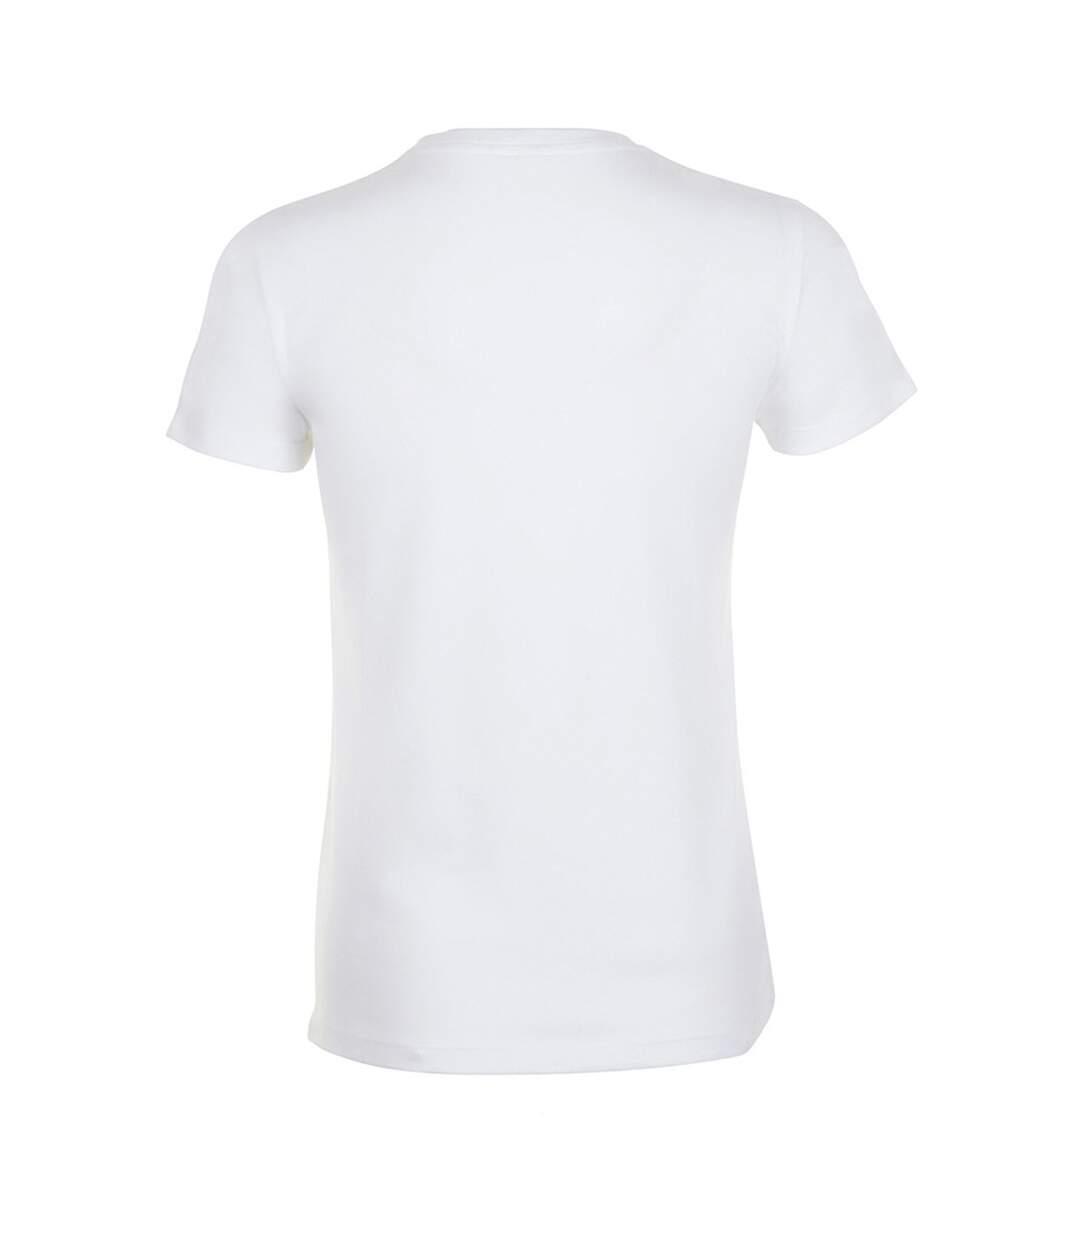 Sols Regent - T-Shirt - Femme (Blanc) - UTPC2792